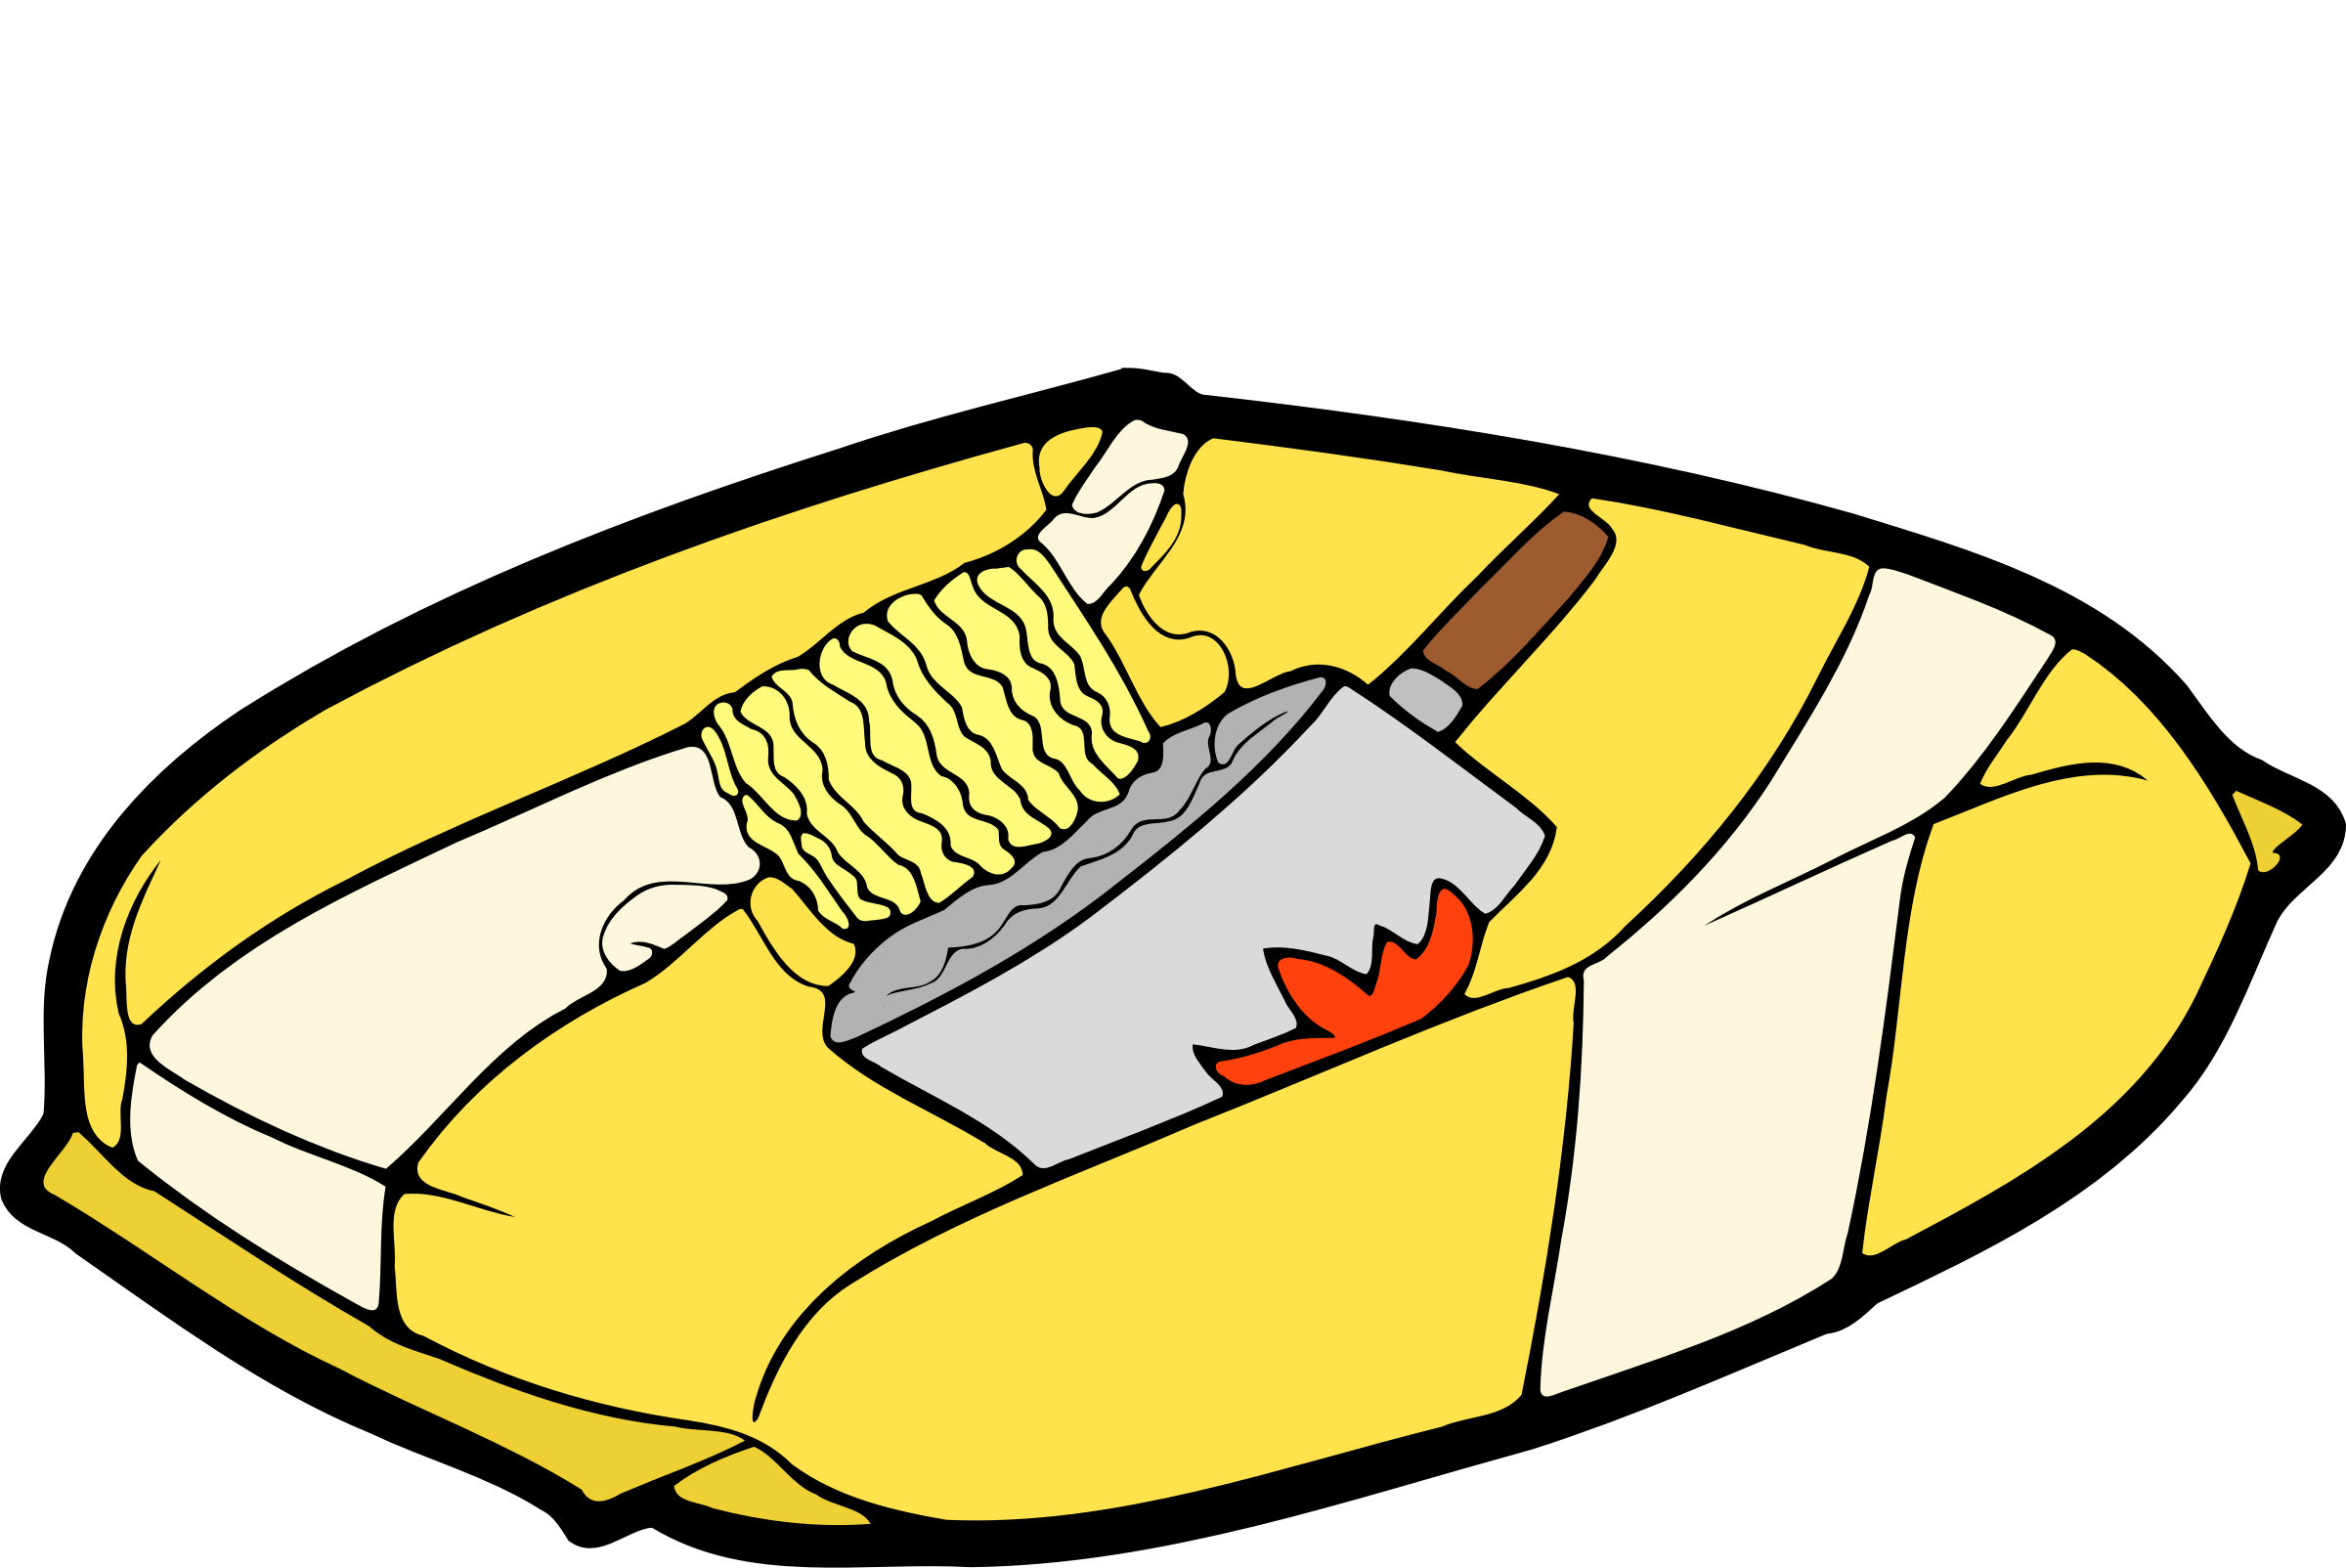 Instant ramen icons png. Noodle clipart top raman